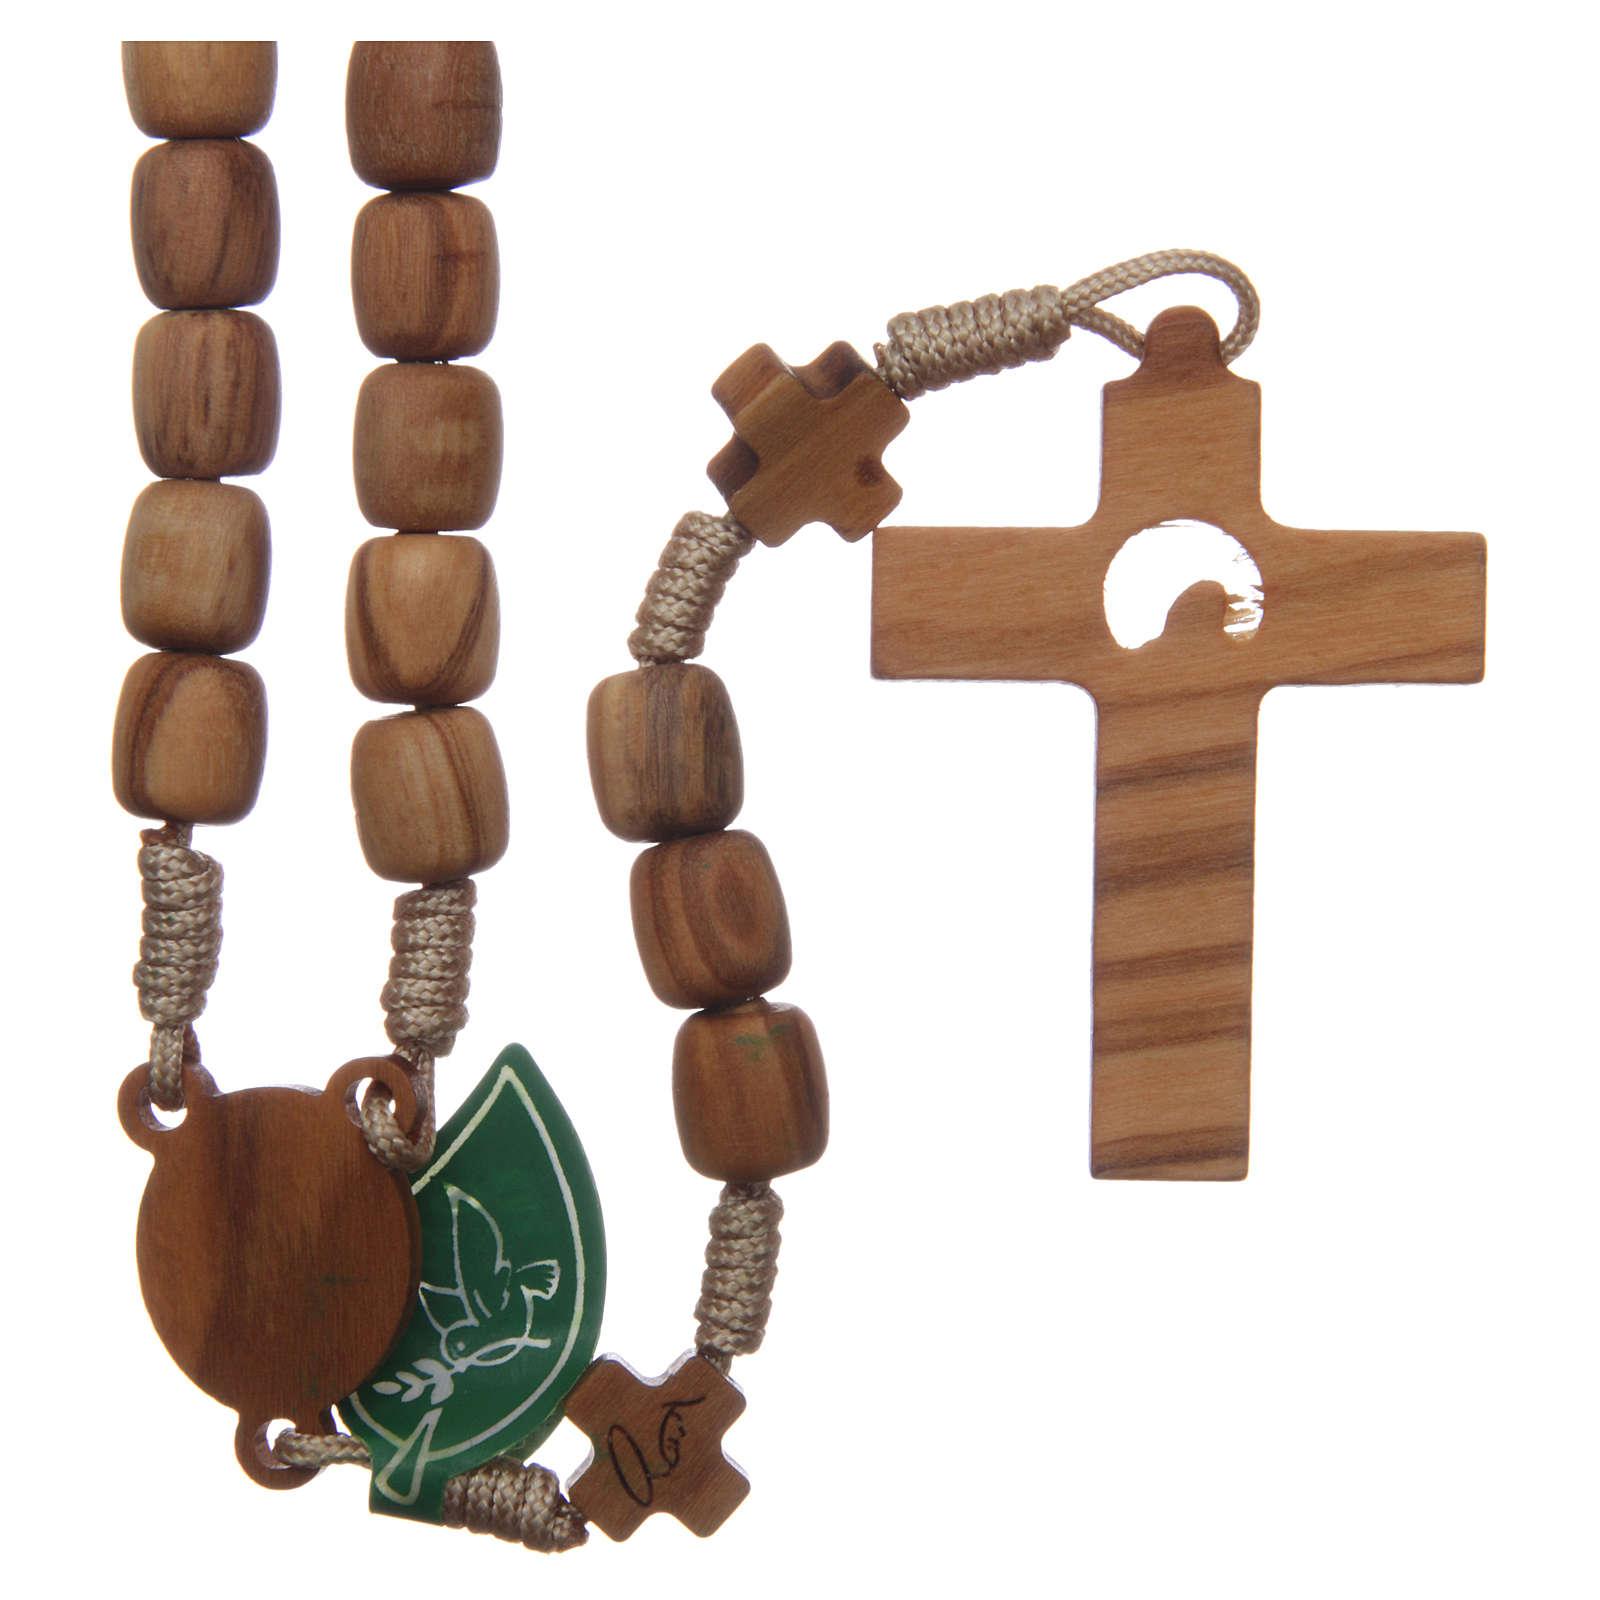 Terço Medjugorje cruzes contas 7 mm oliveira corda bege 4